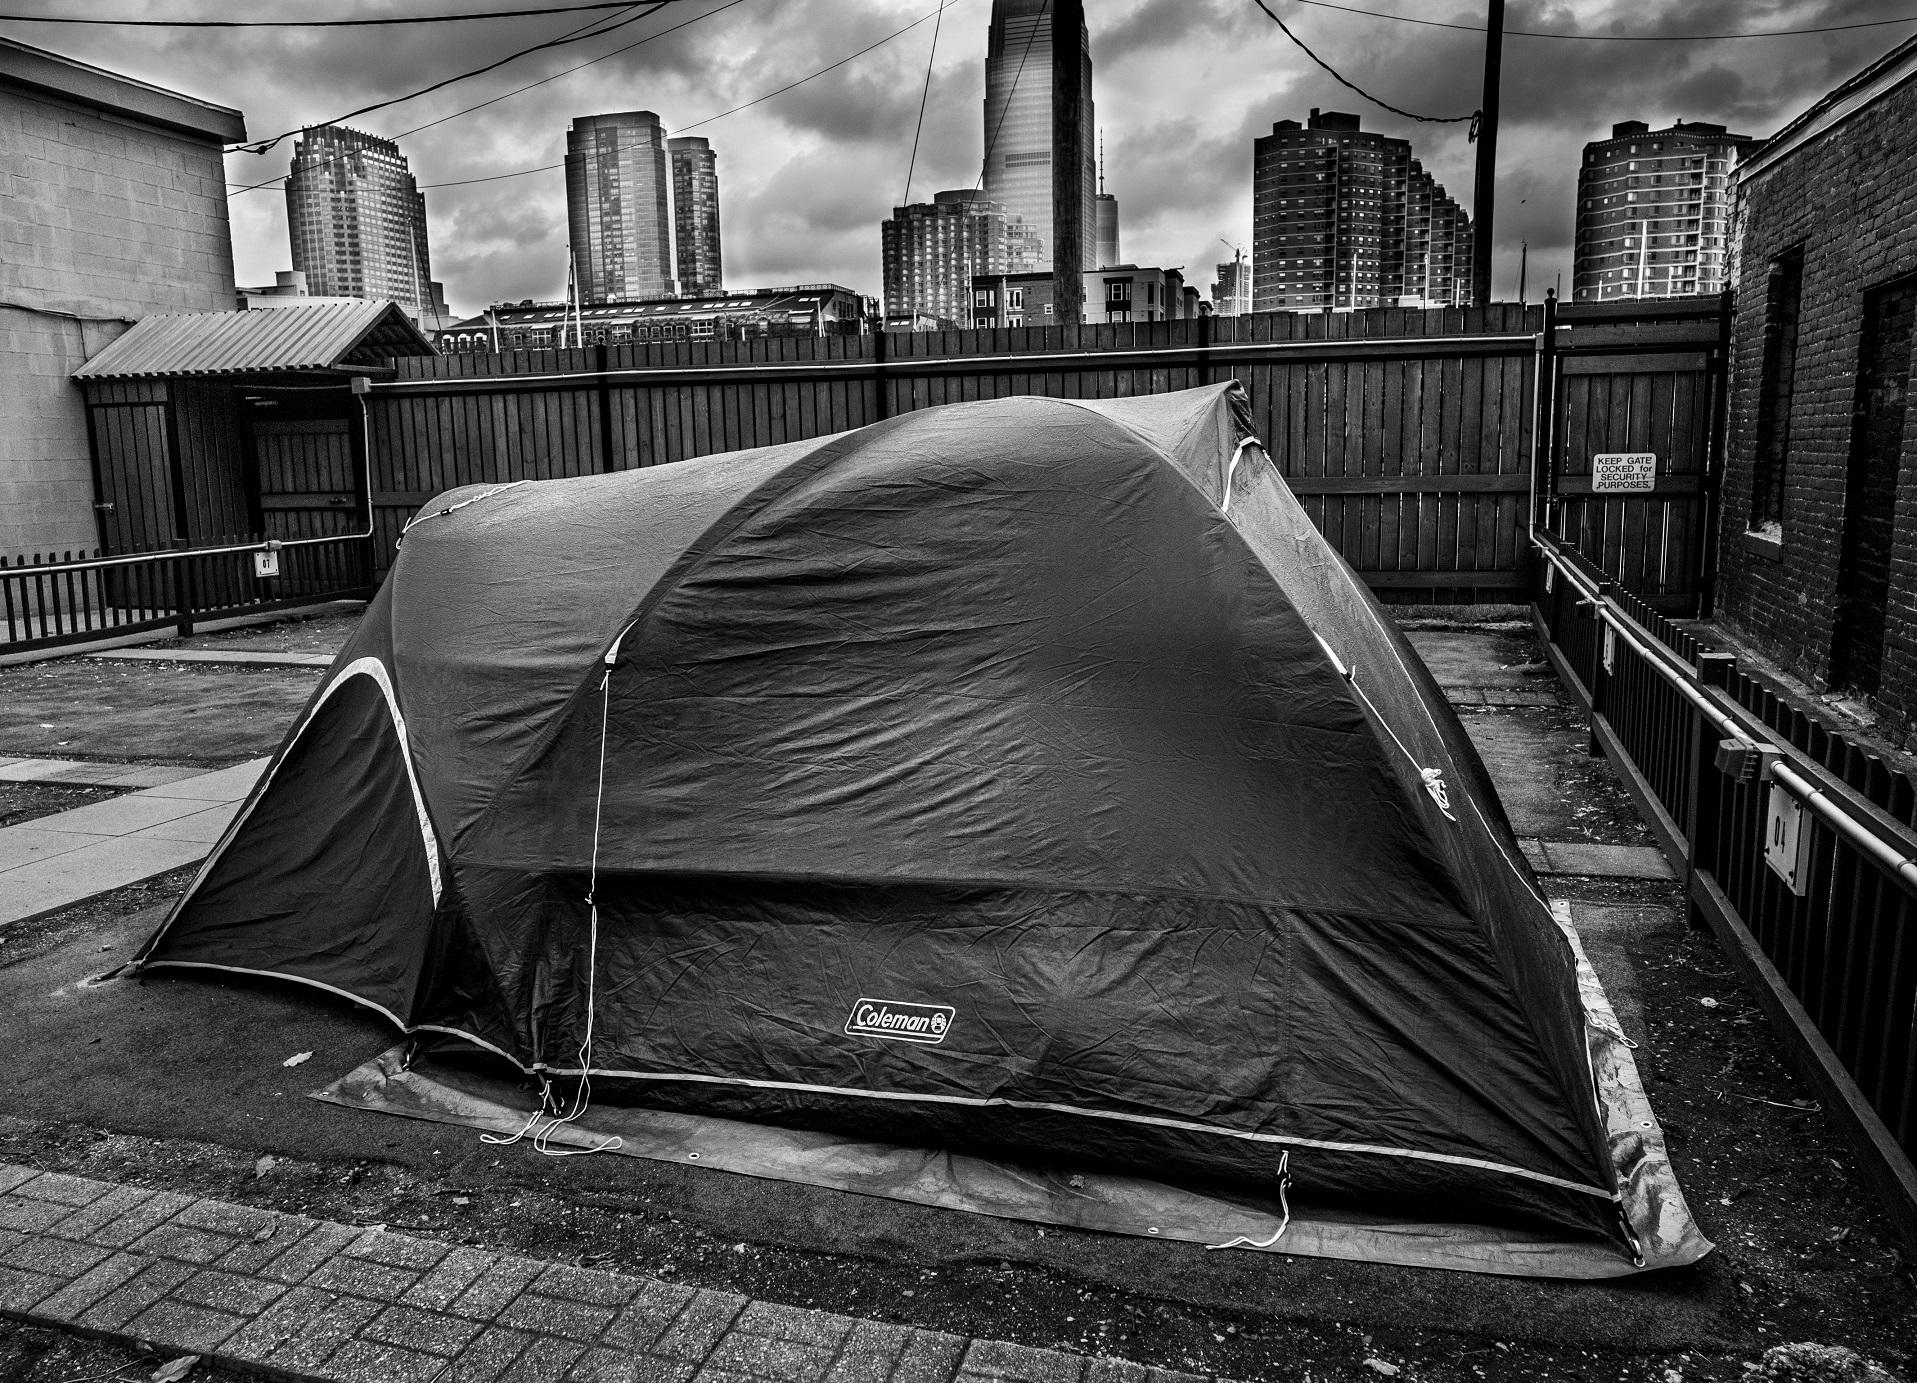 campsite-jersey-city-2016-daniel-d-teoli-jr.jpg